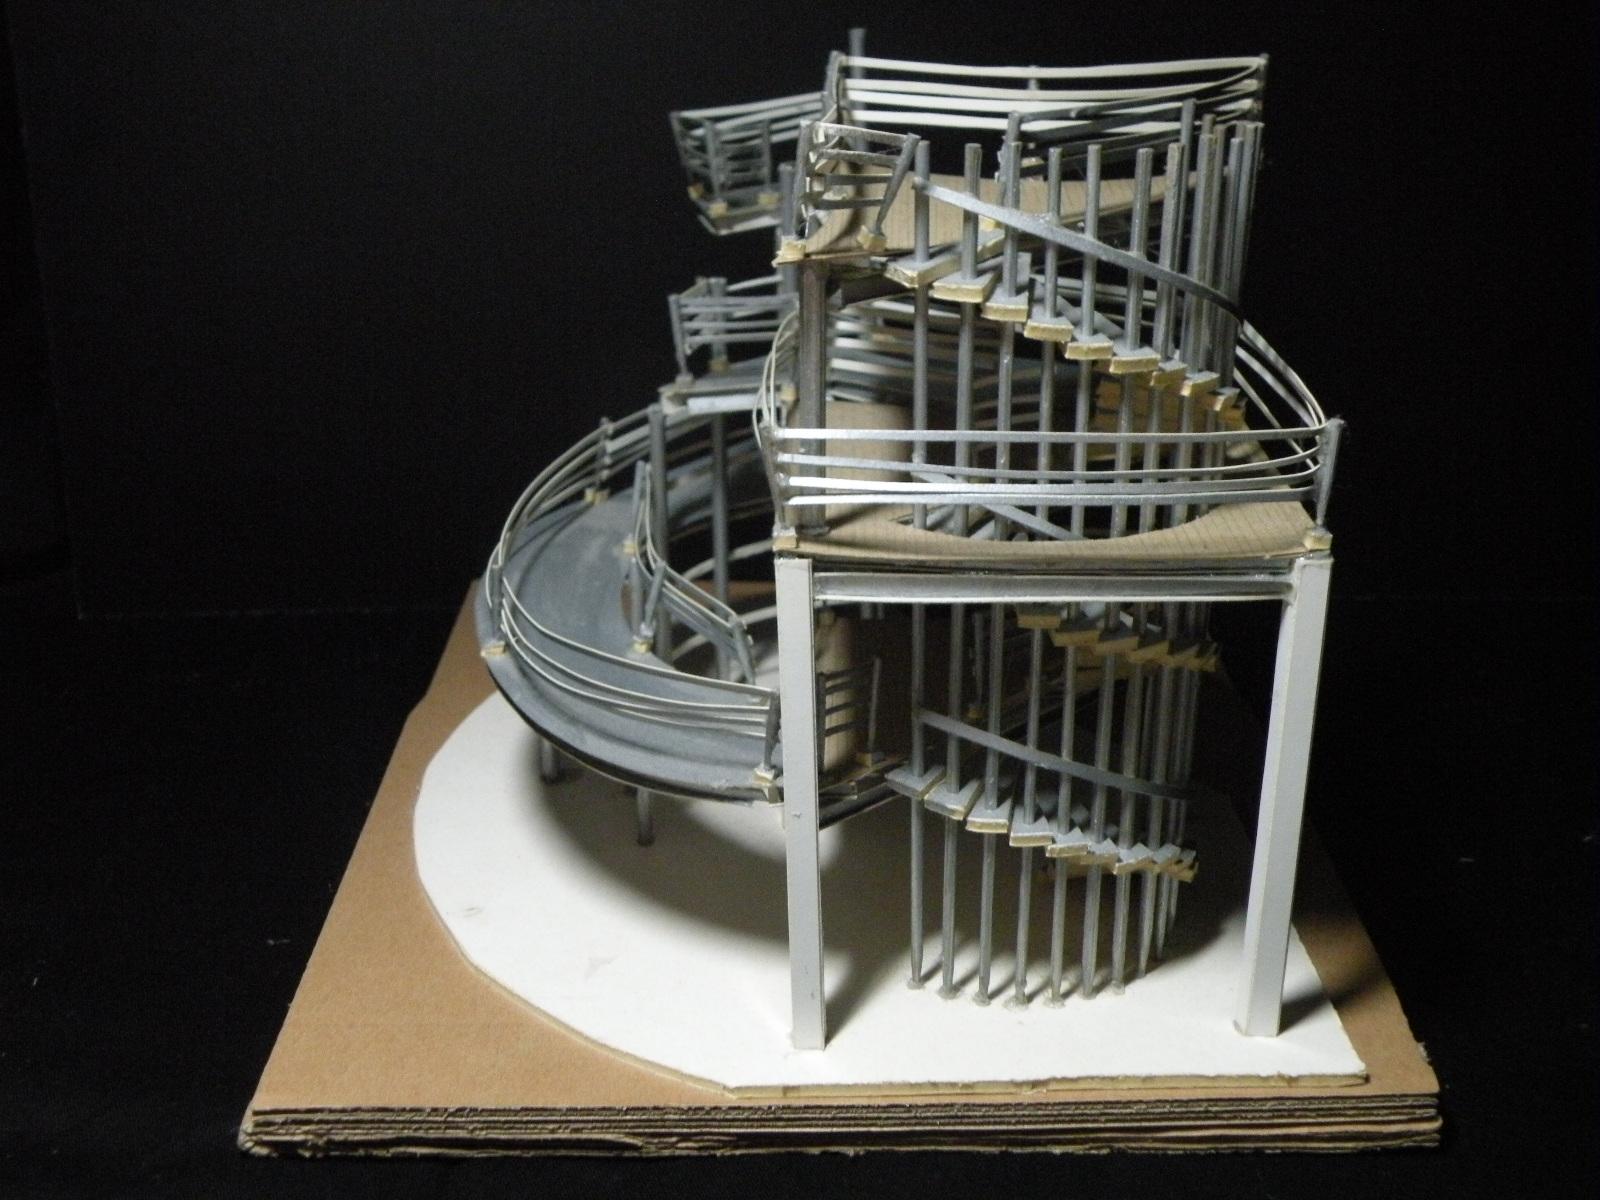 watch tower design by siti rafe u0026 39 ah omer at coroflot com